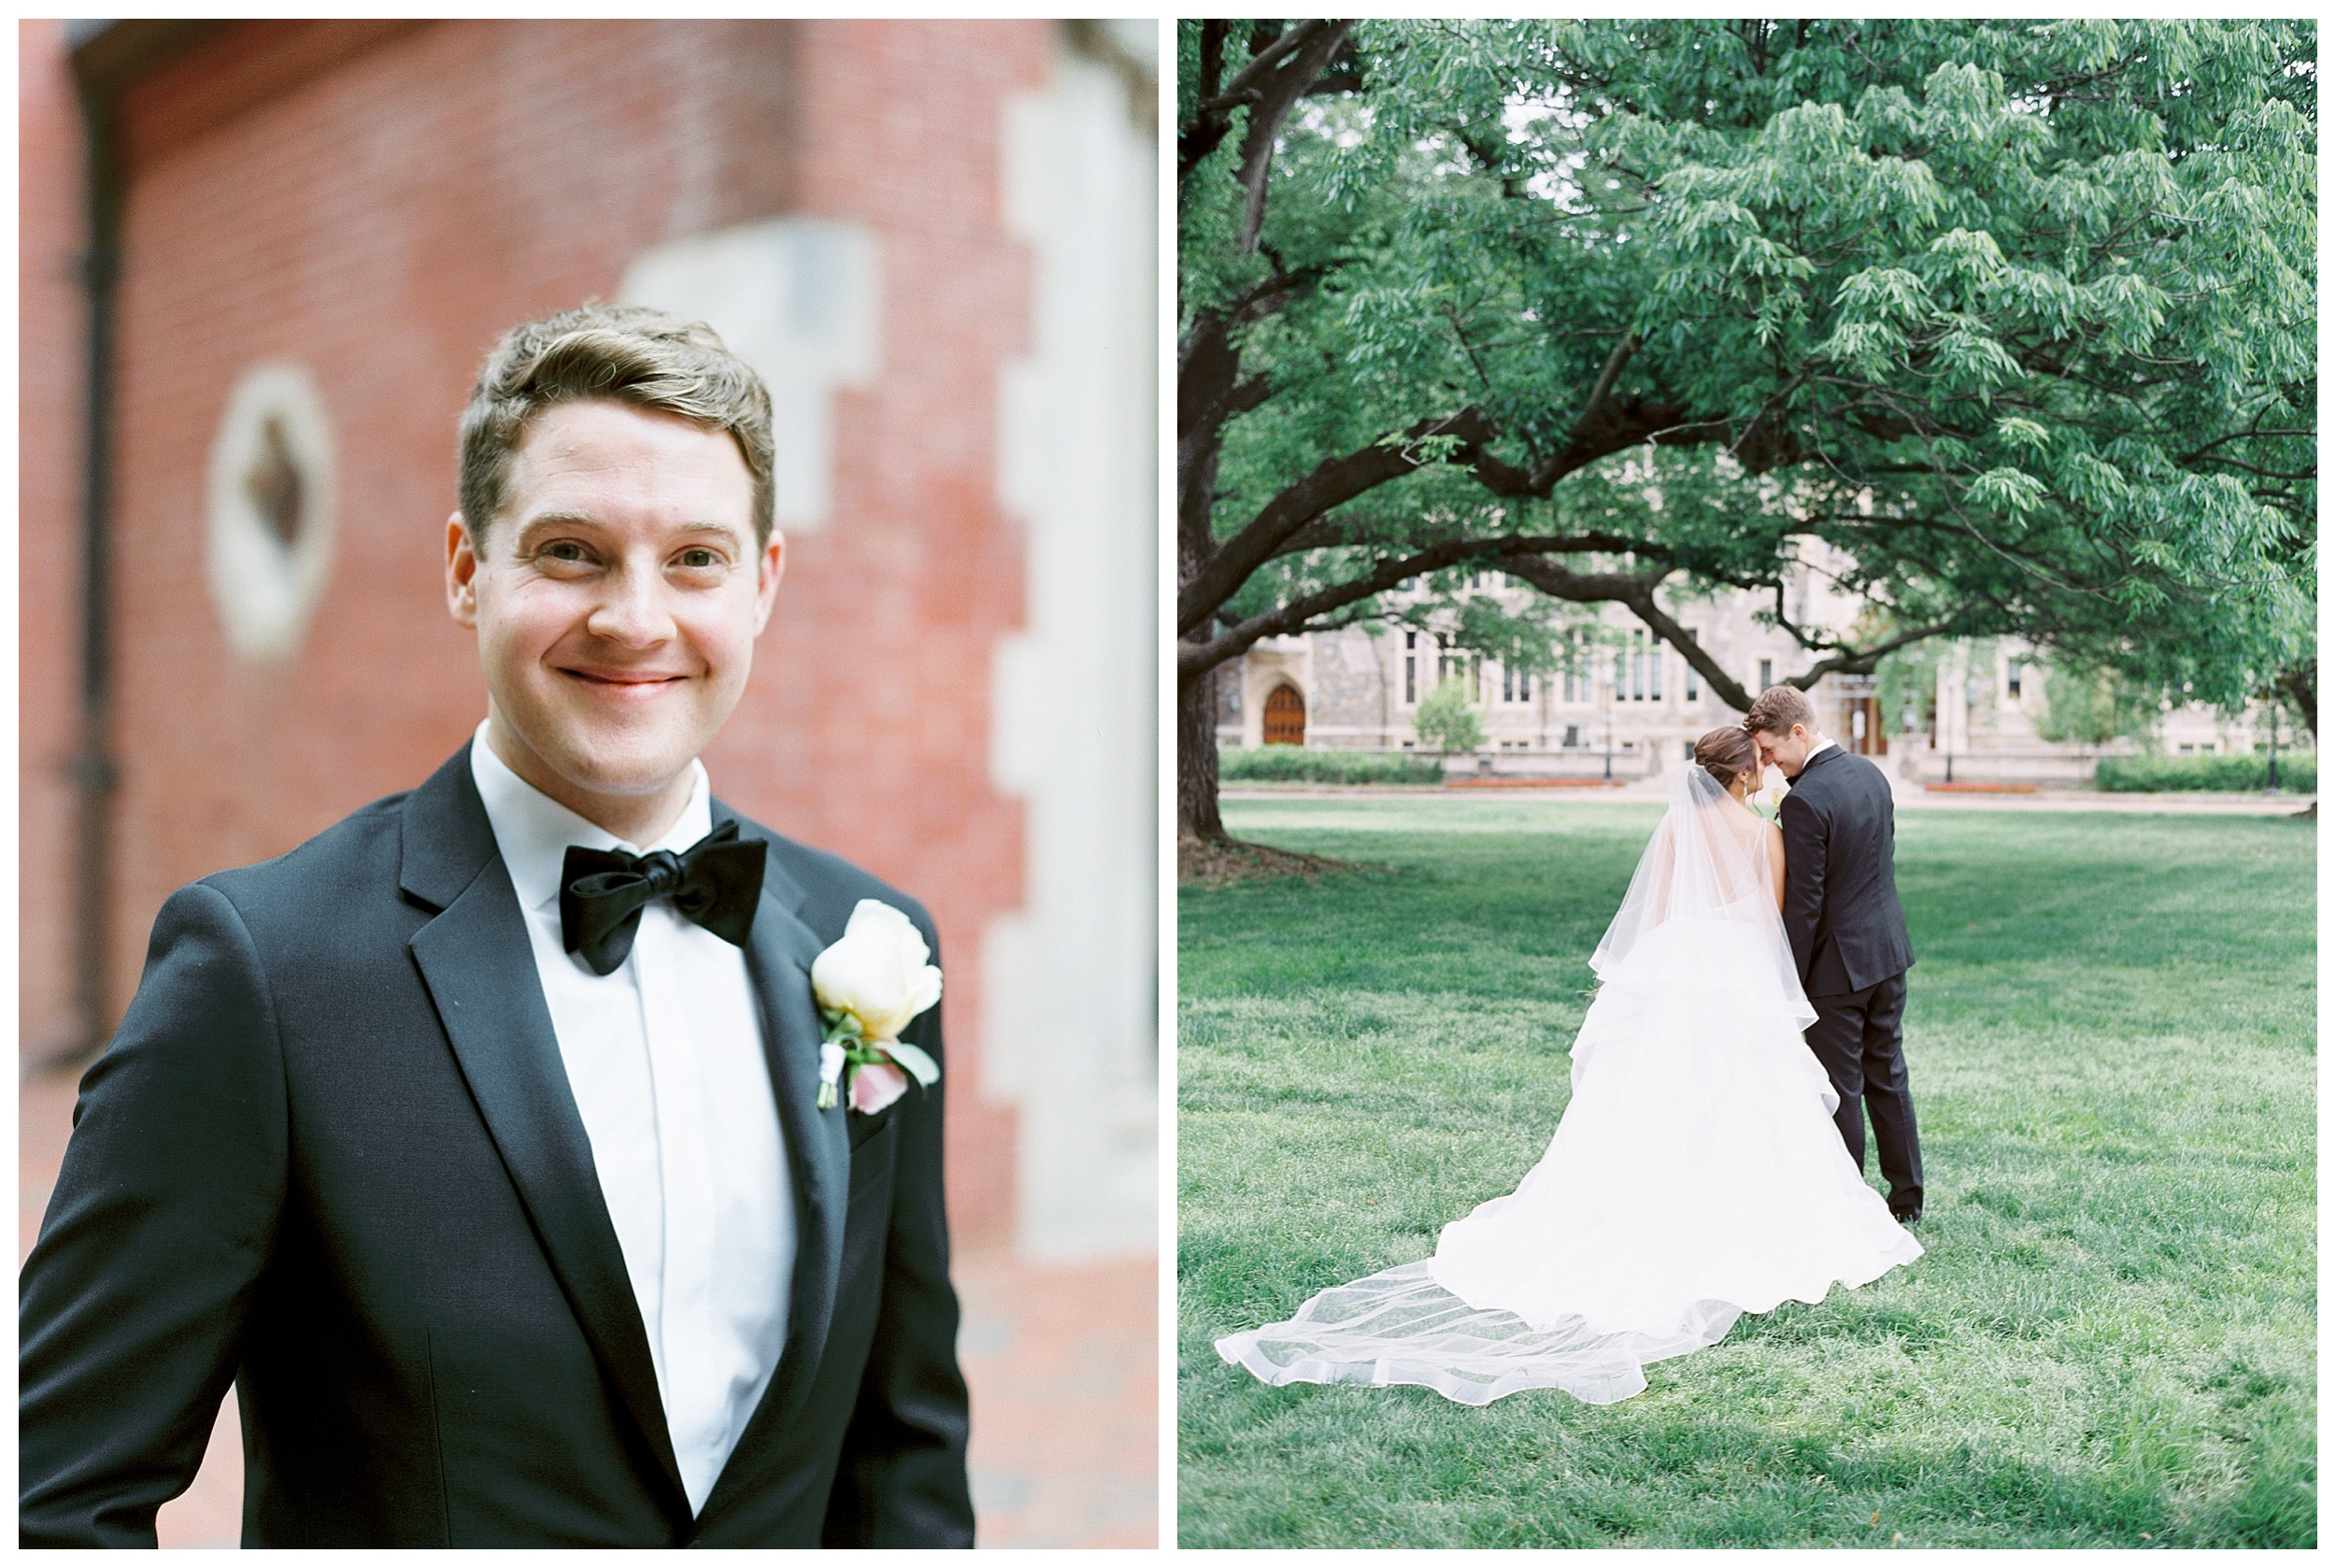 DAR Constitution Hall Wedding Wedding | Daughters of the American Revolution Wedding | District of Columbia Film Wedding Photographer Kir Tuben_0055.jpg